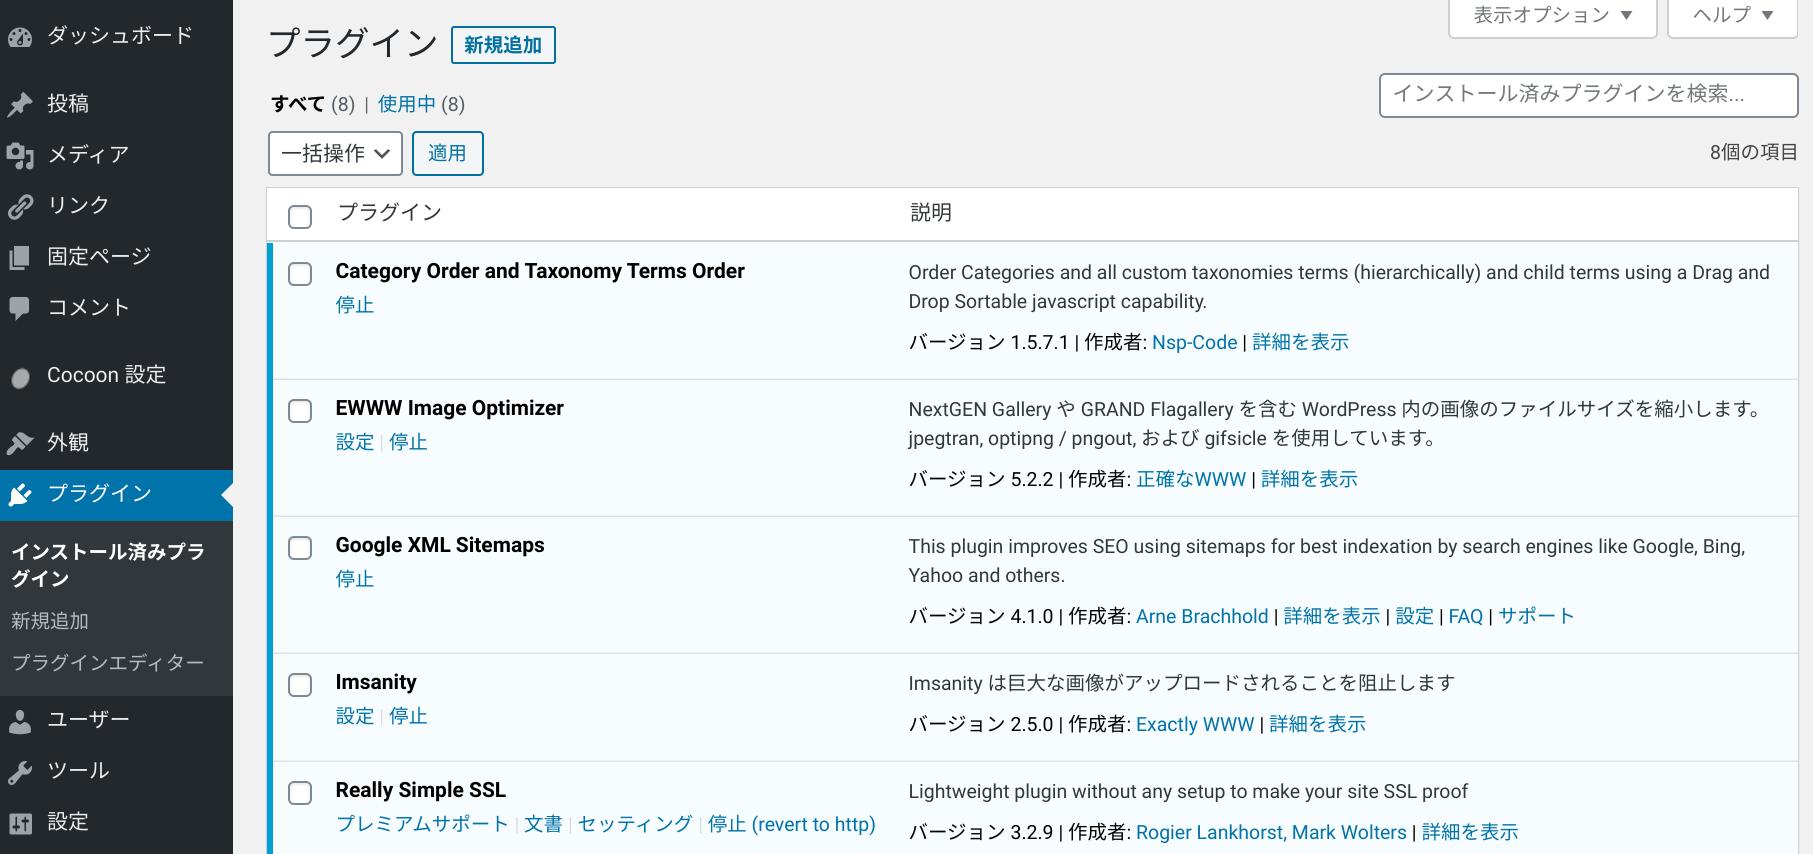 WordPressのプラグイン画面